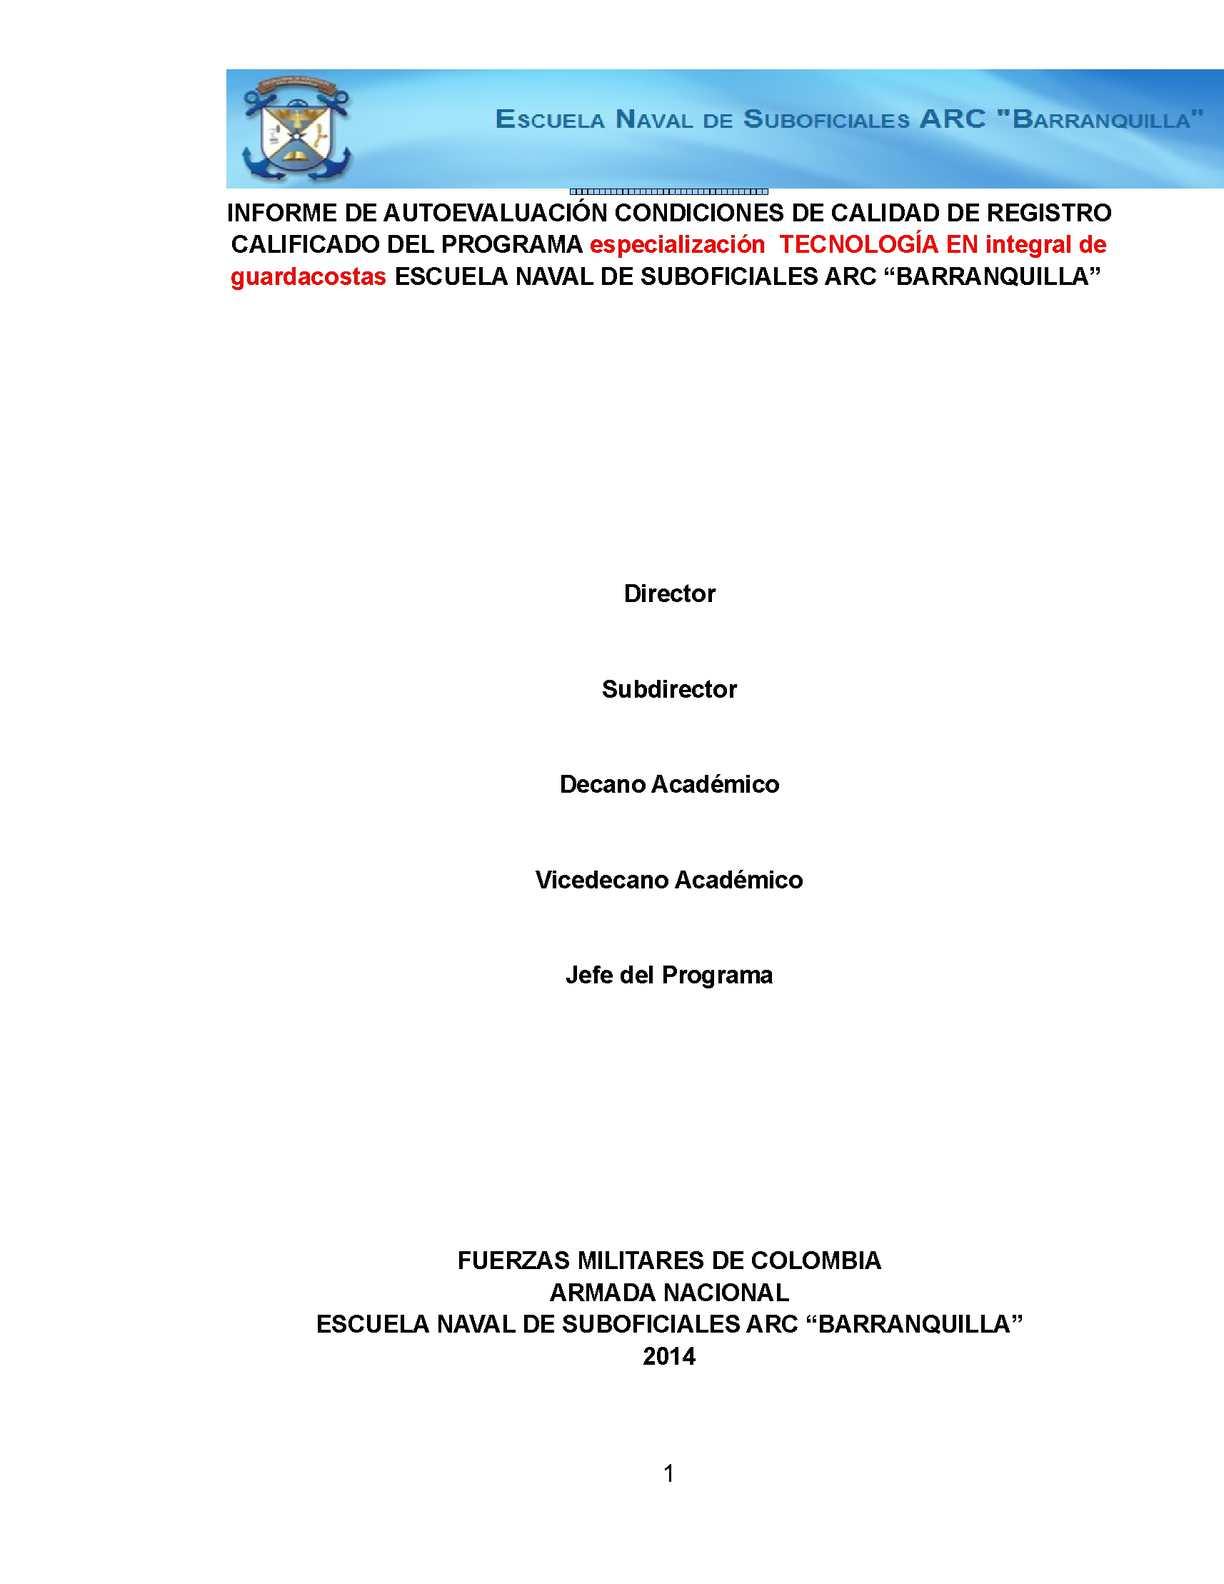 Calaméo - Plantilla Documento Maestro Guardacostas